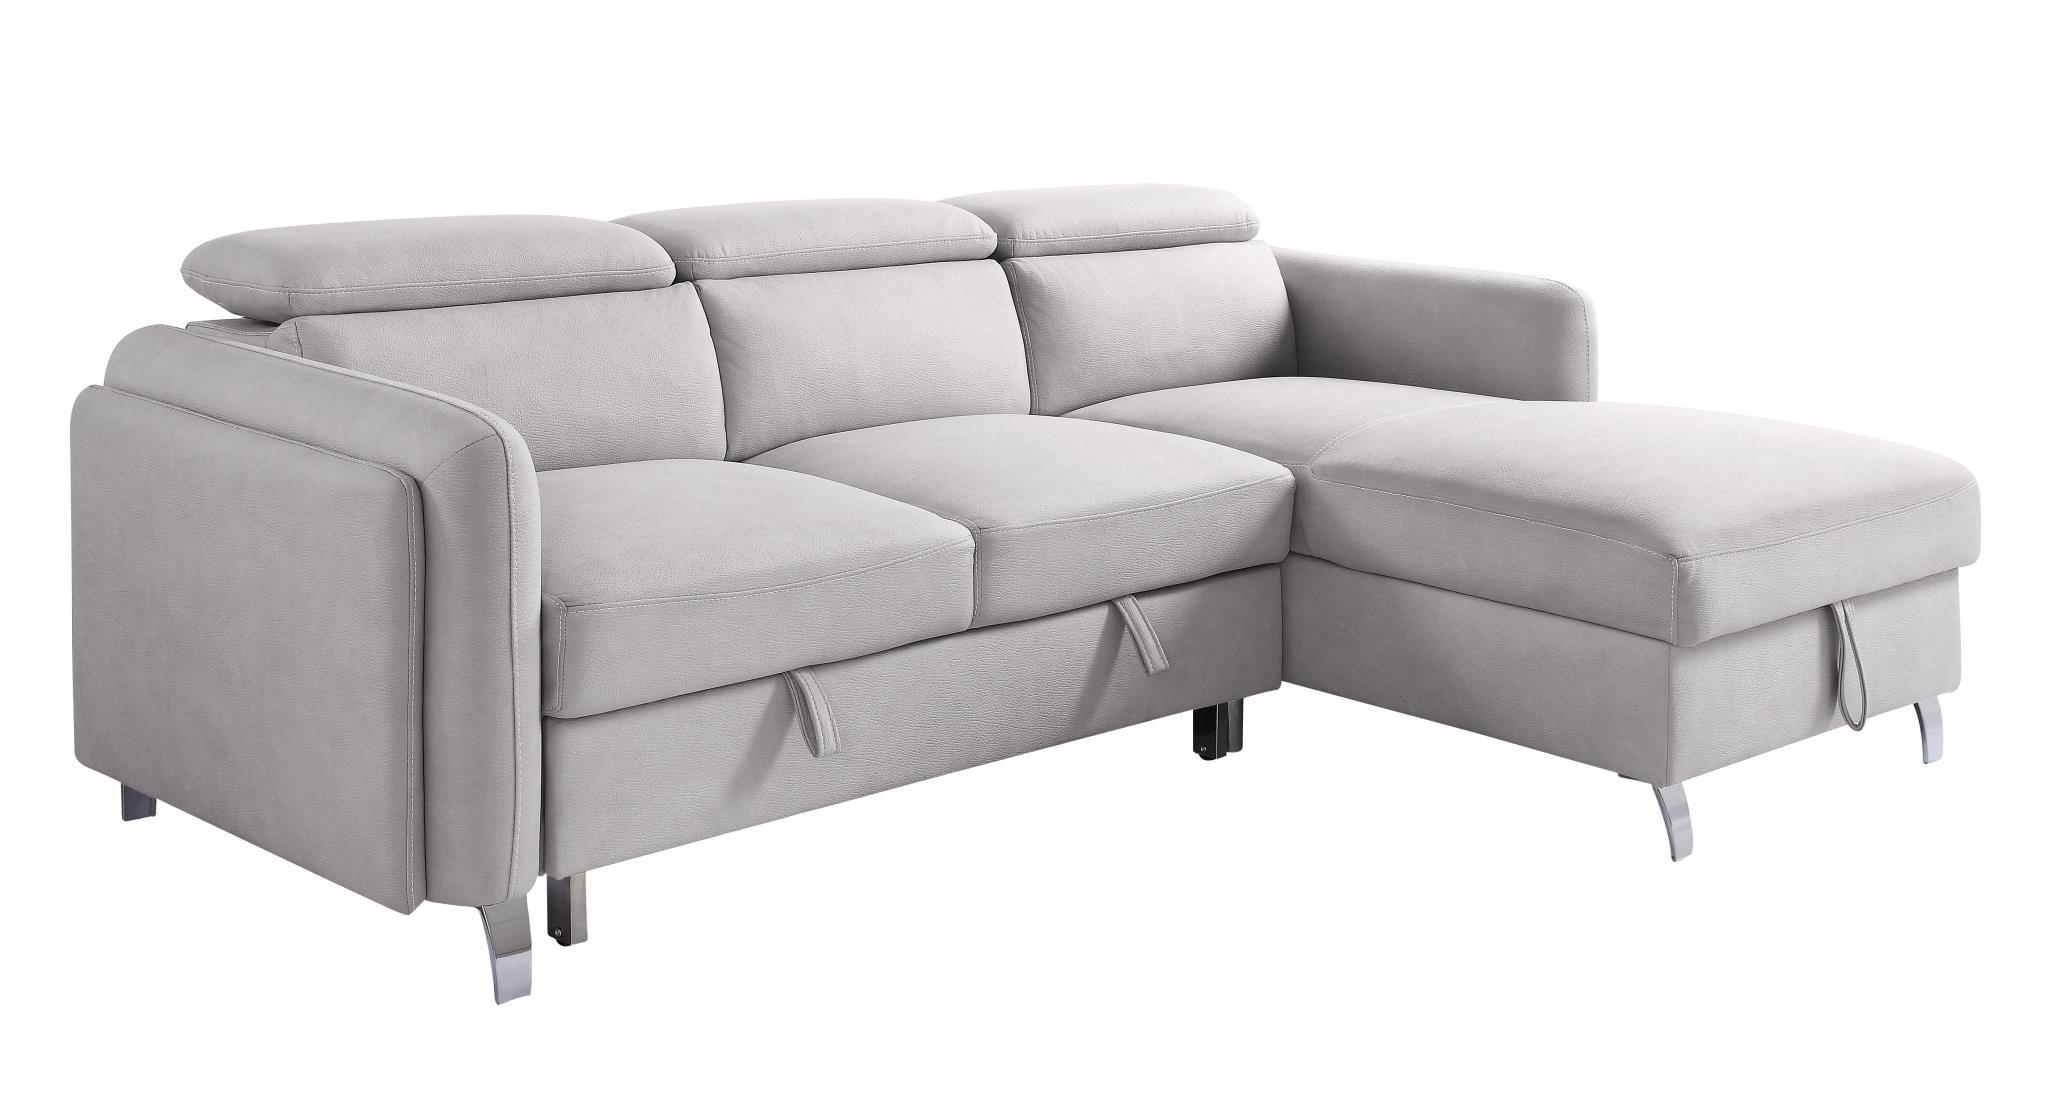 - Reyes Sleeper Sectional Sofa KFROOMS Grey Sectional Sofa Sale